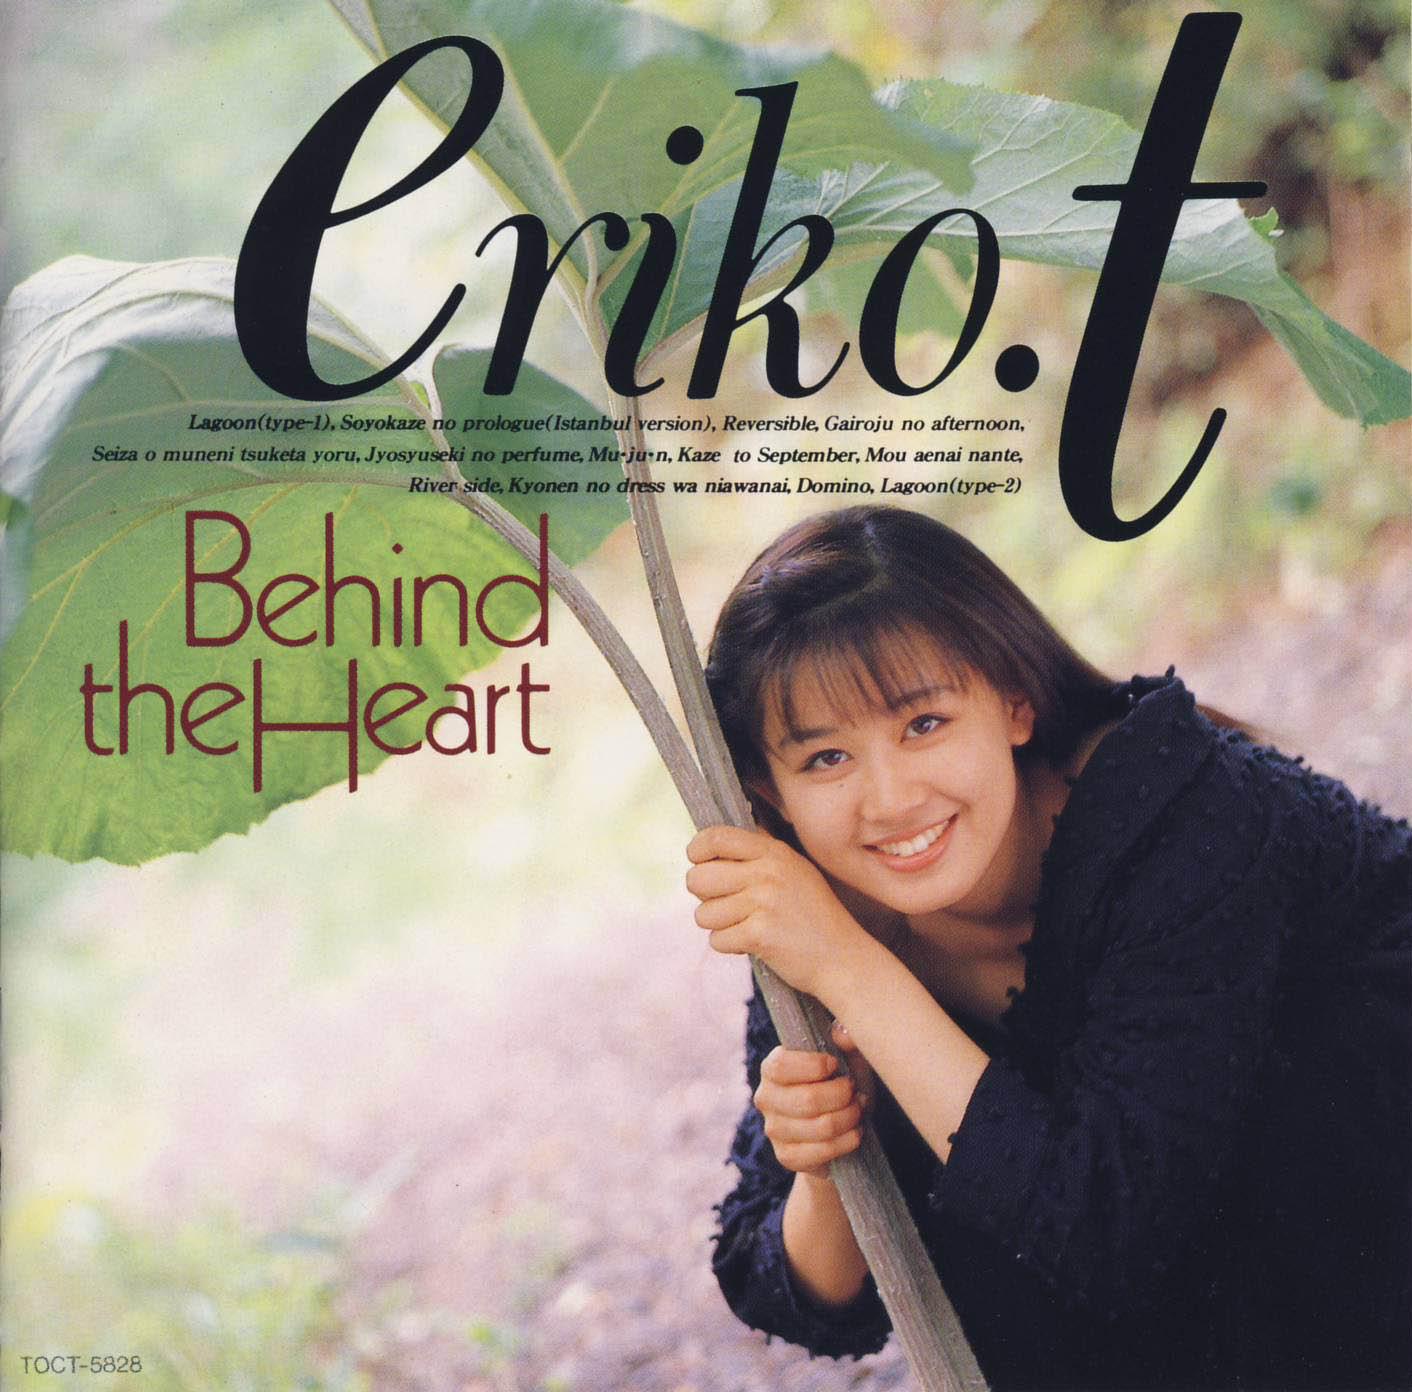 20170803.0245.02 Eriko Tamura - Behind the Heart (1990) cover.jpg